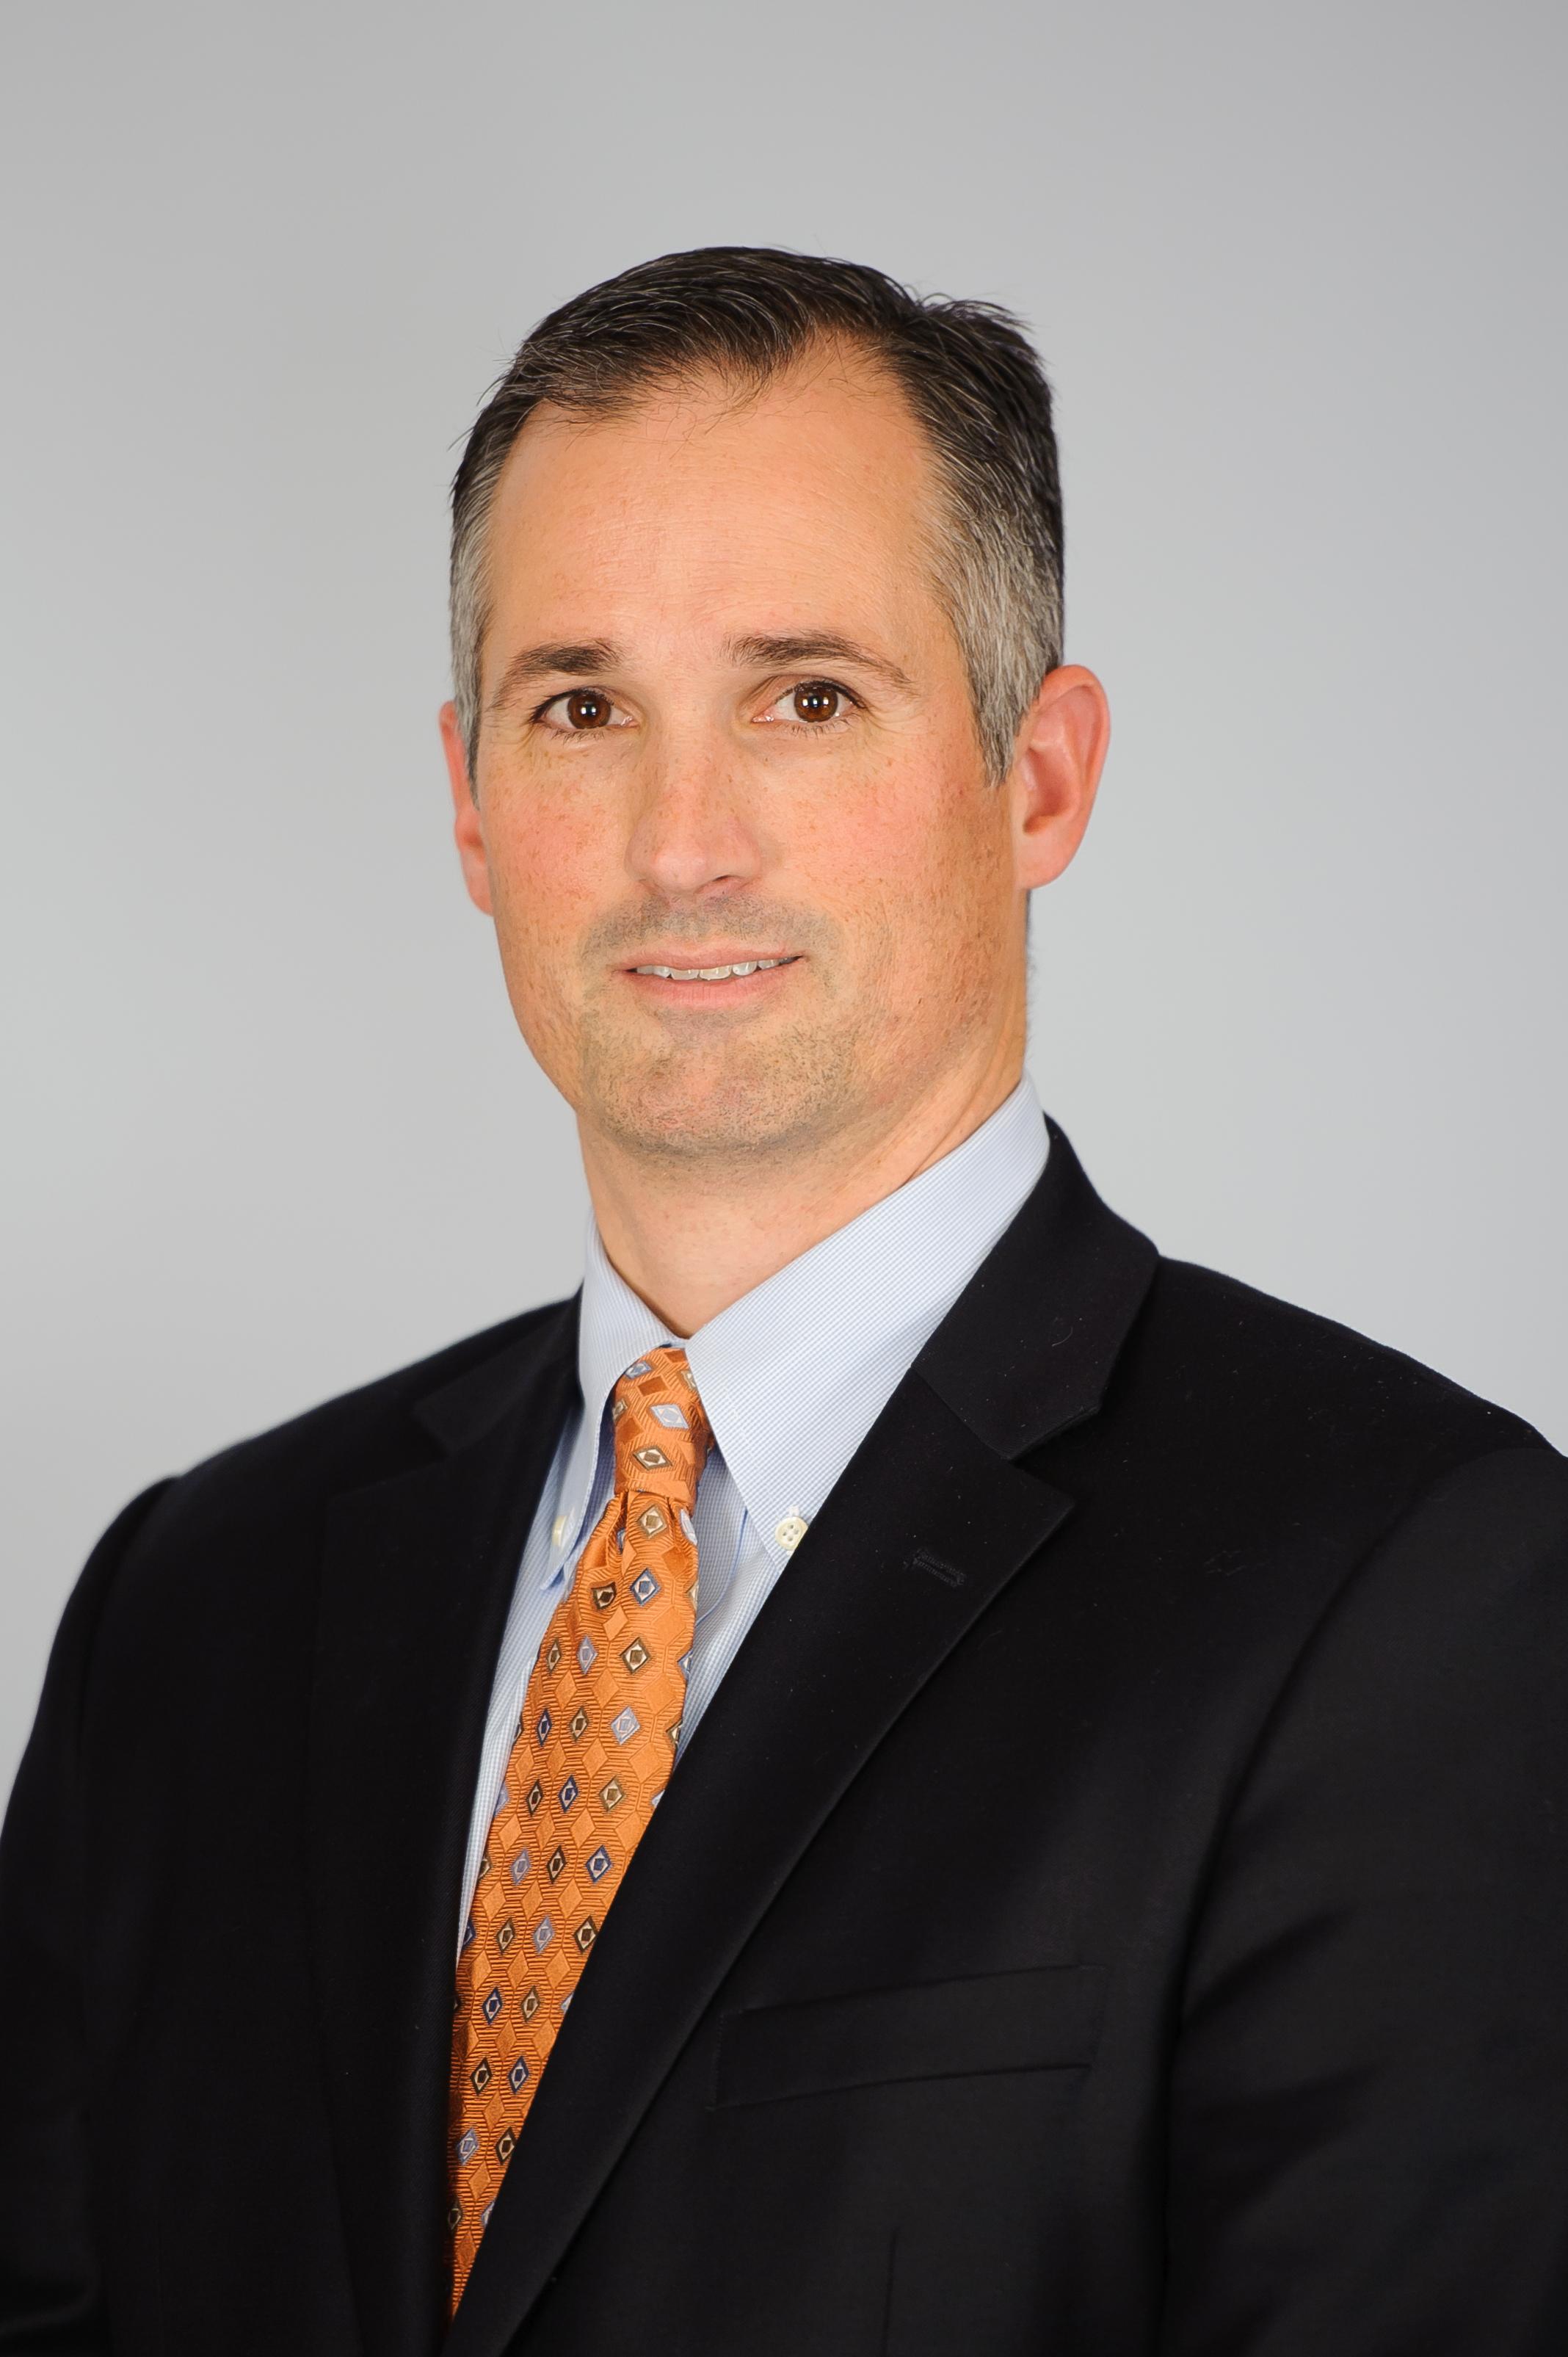 Timothy Moura Named Senior Vice President at Narragansett Bay Insurance - JH Communications